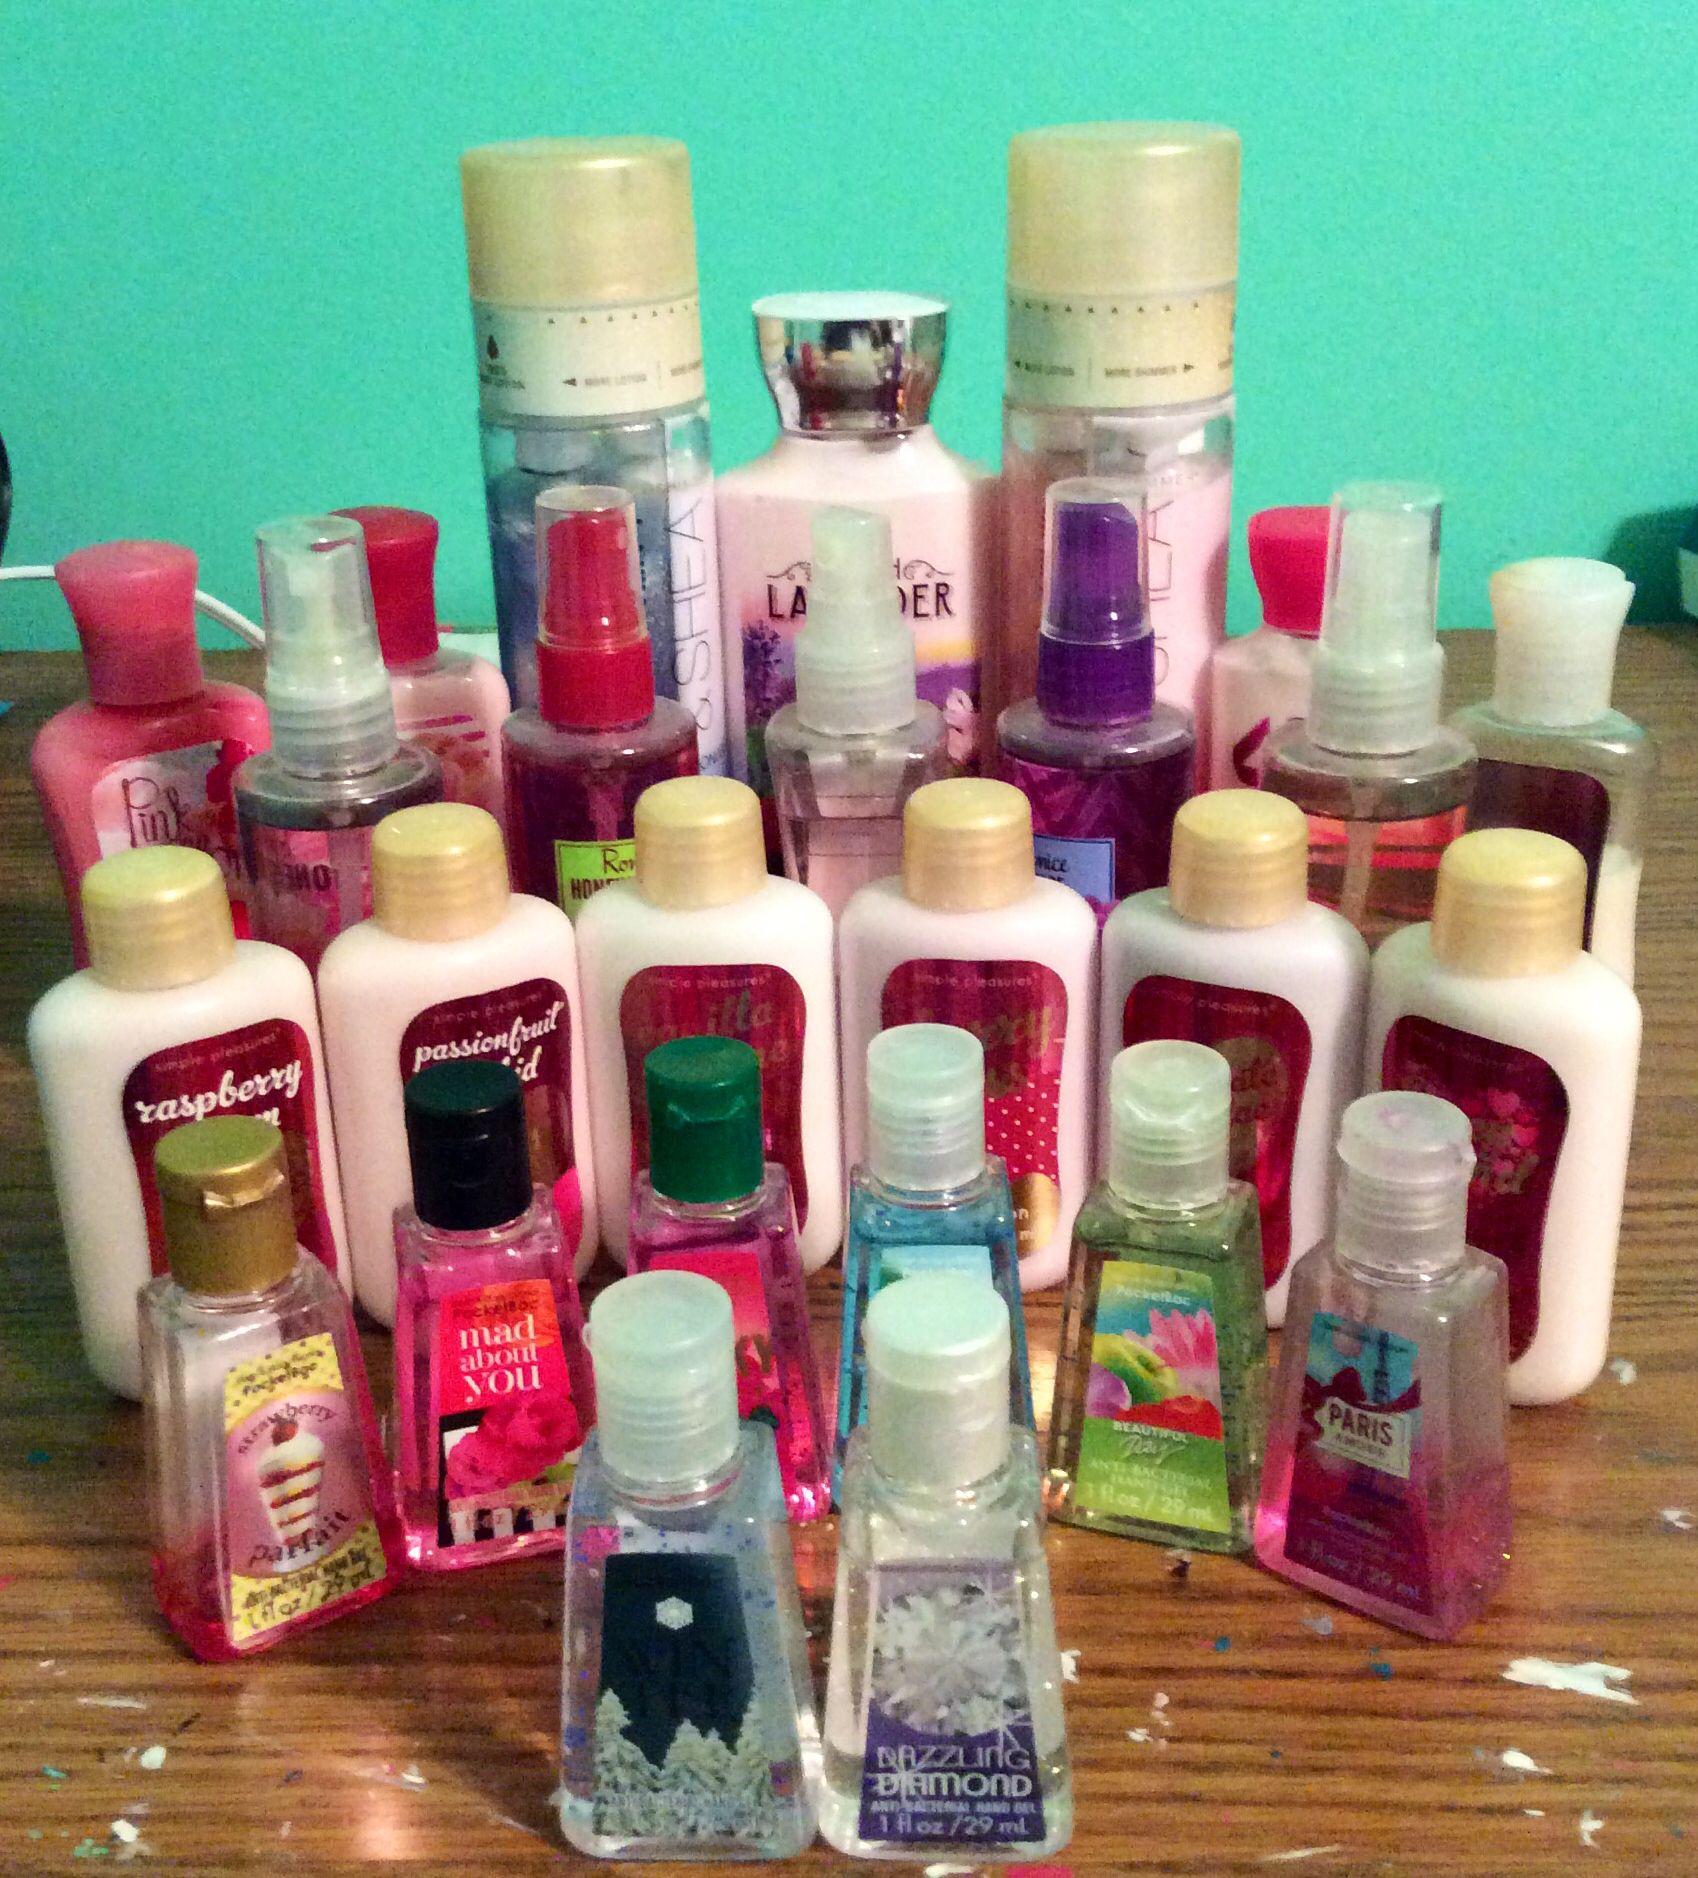 Etude House Hello Perfume Hand Sanitizer 30ml Perfume Etude House